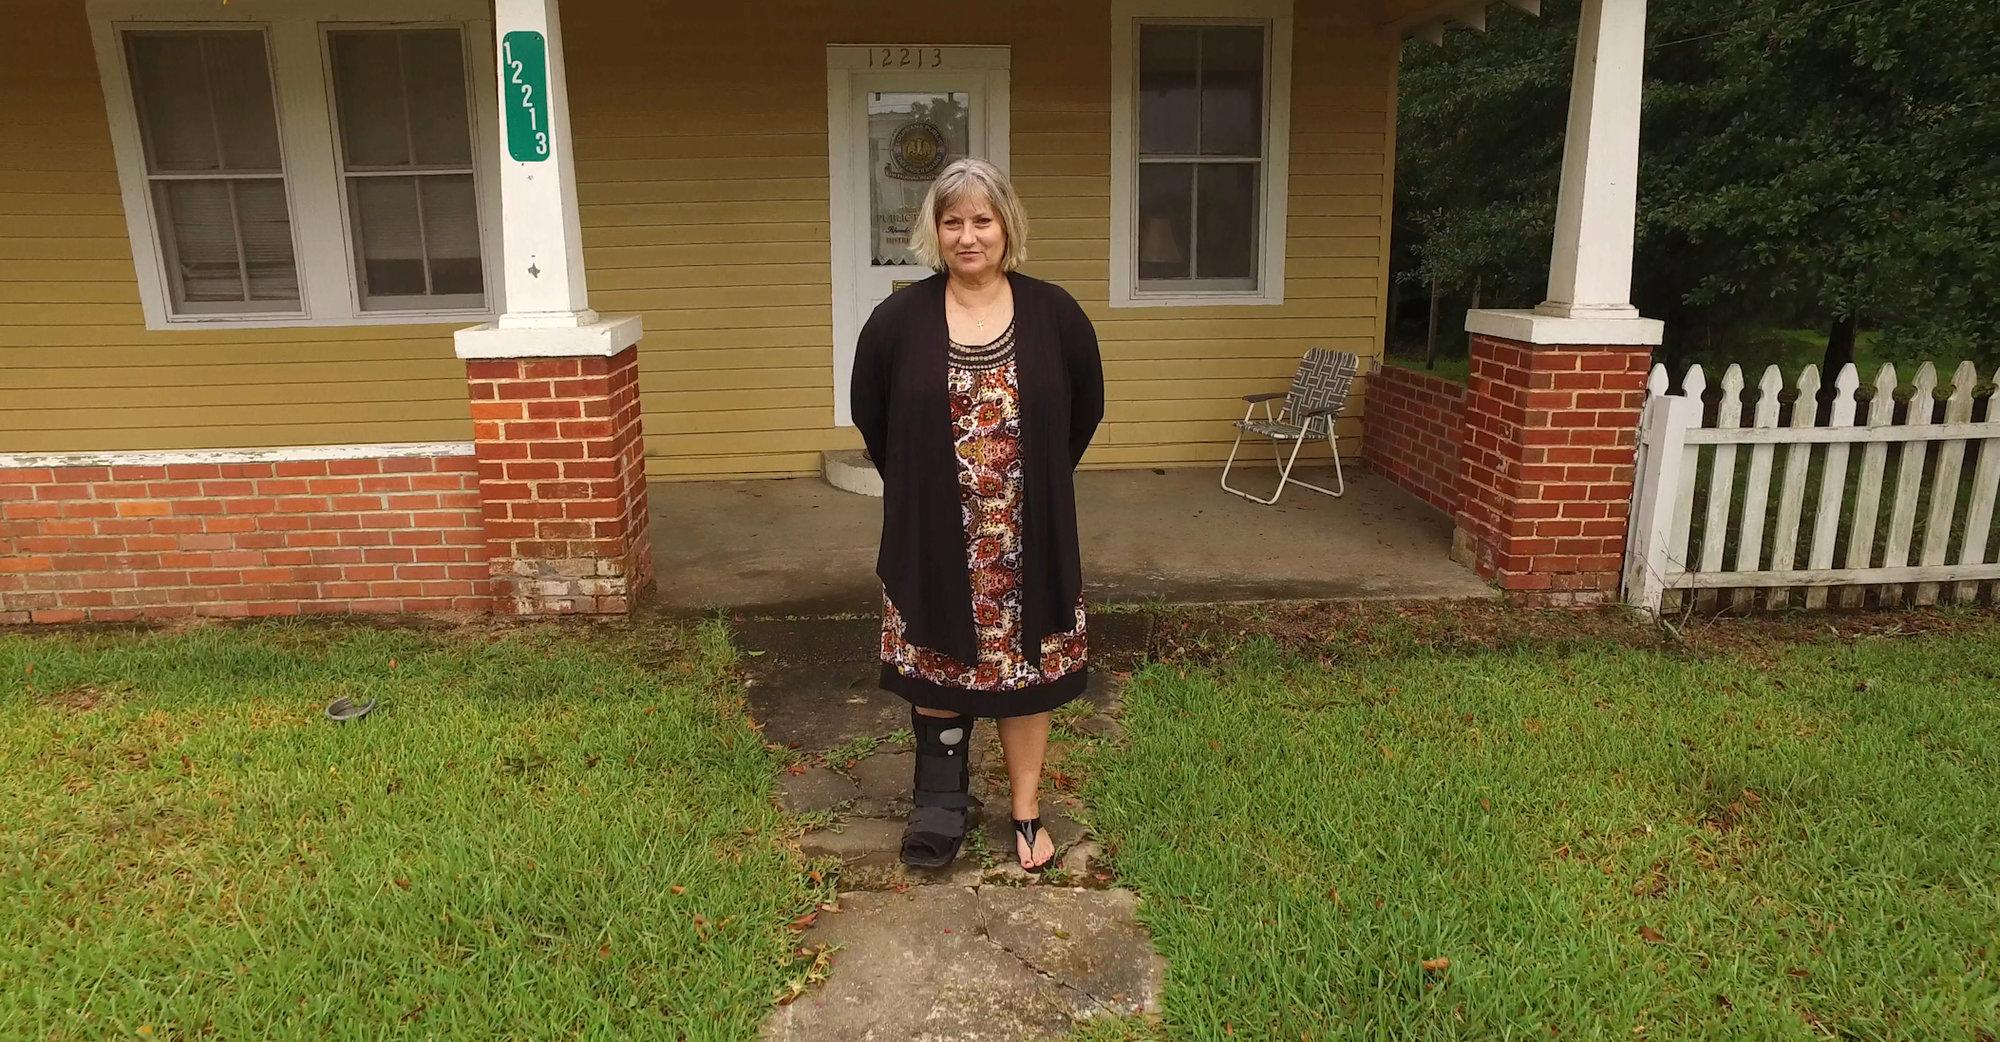 Rhonda Covington, the lone, full-time public defender in the 20th Judicial District of Louisiana.